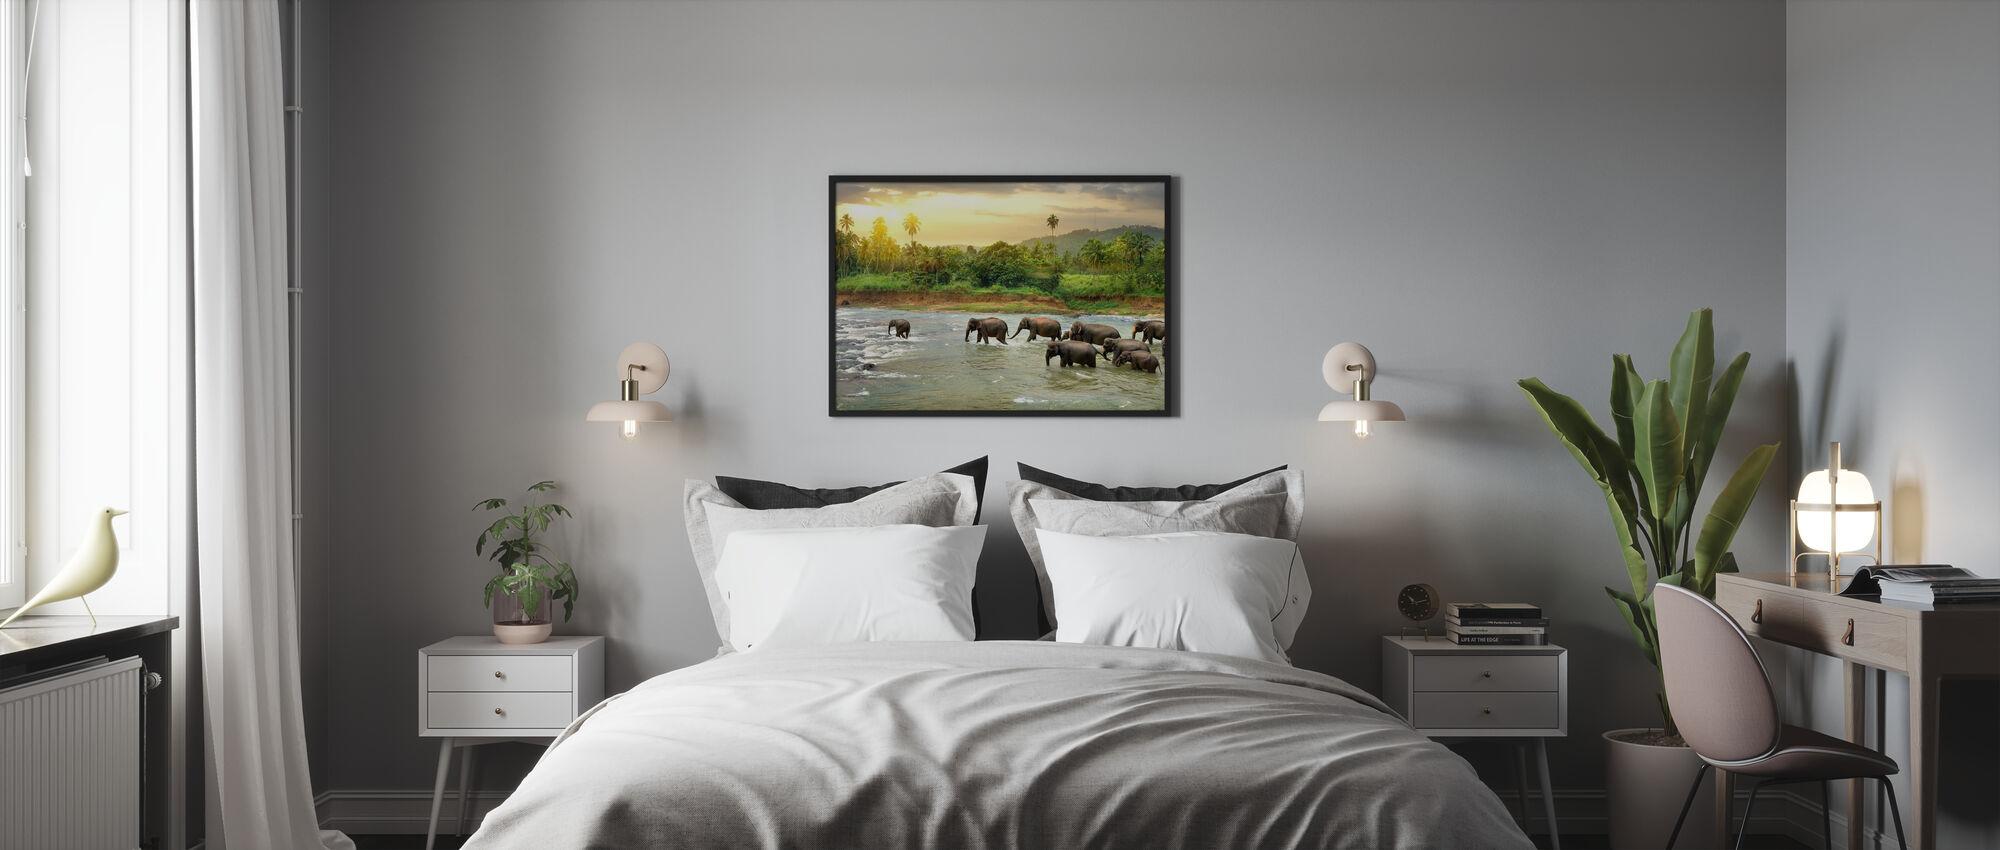 Watelefantenherde - Poster - Schlafzimmer